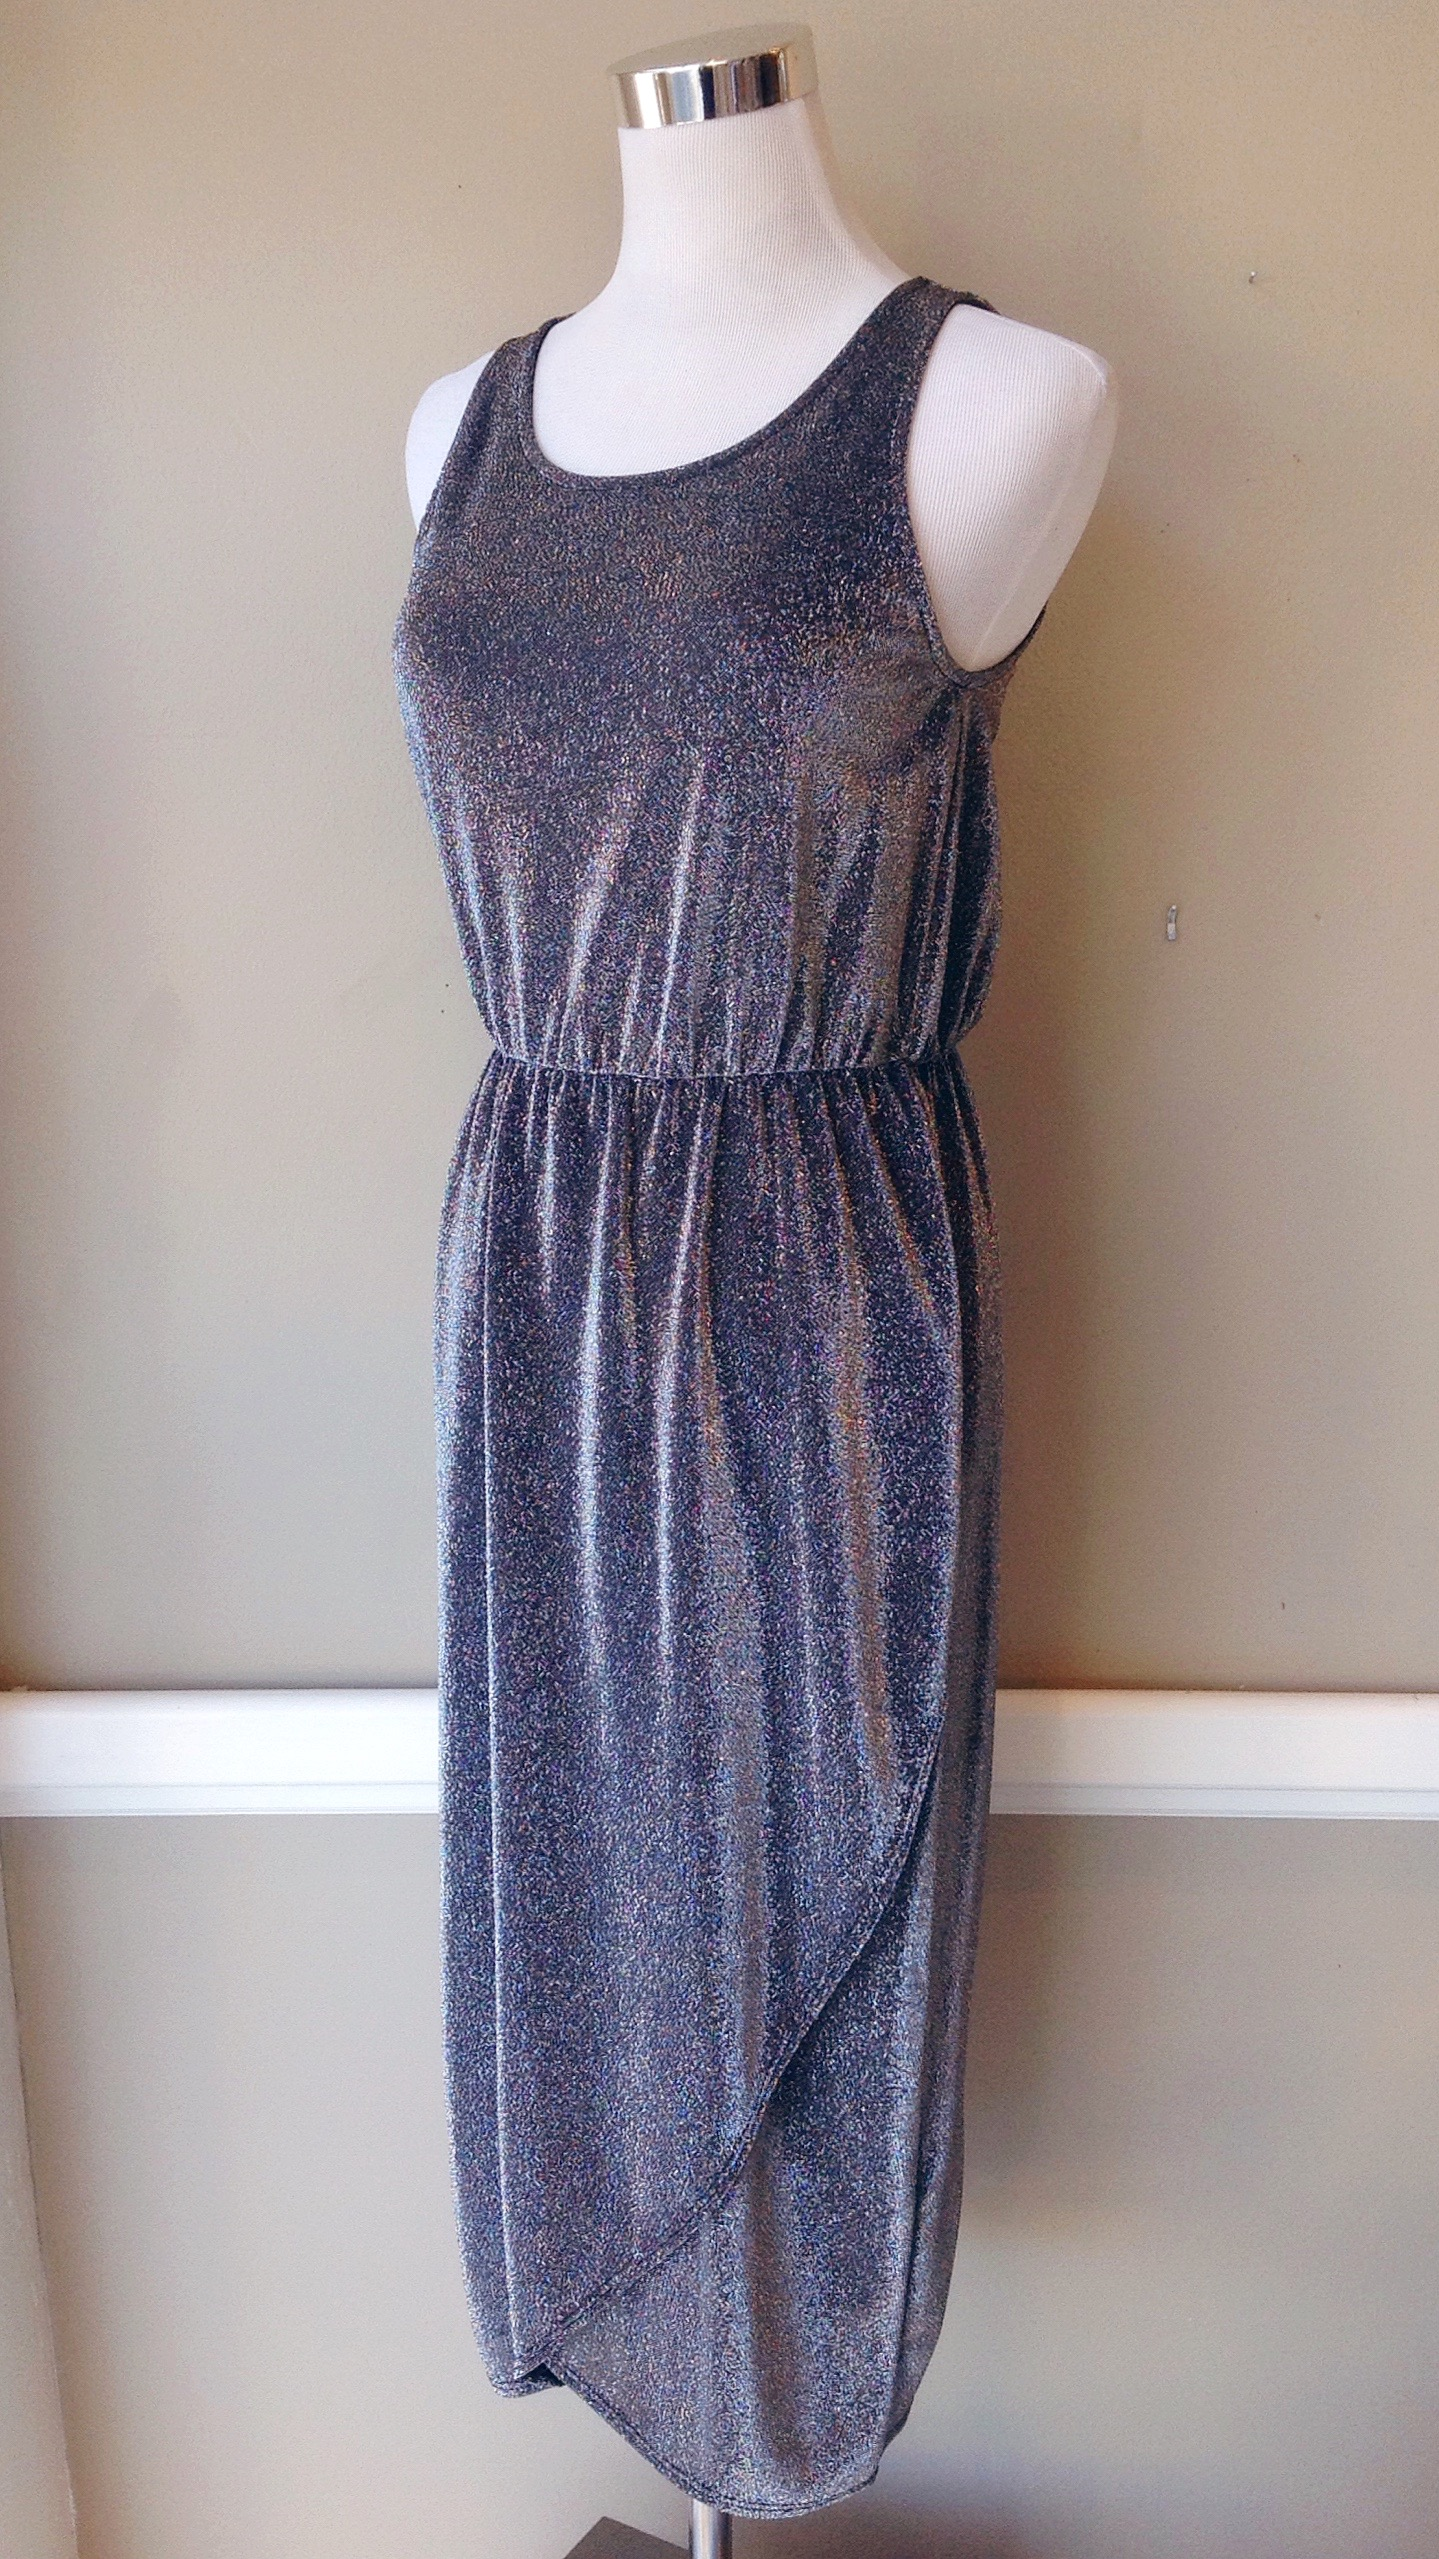 Silver sparkle midi dress, $38